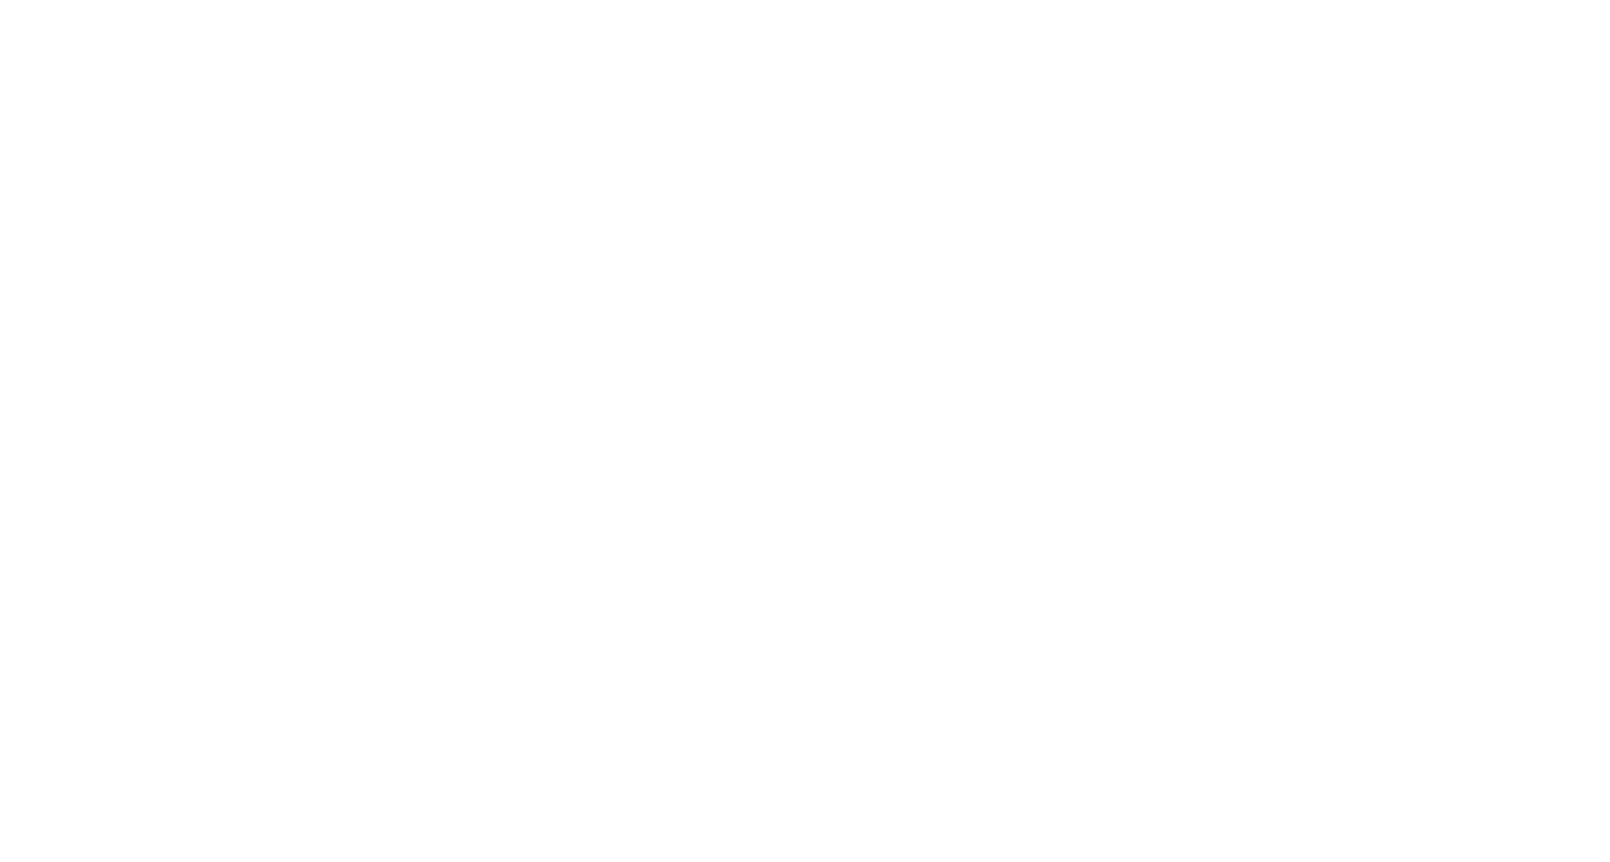 paycalc